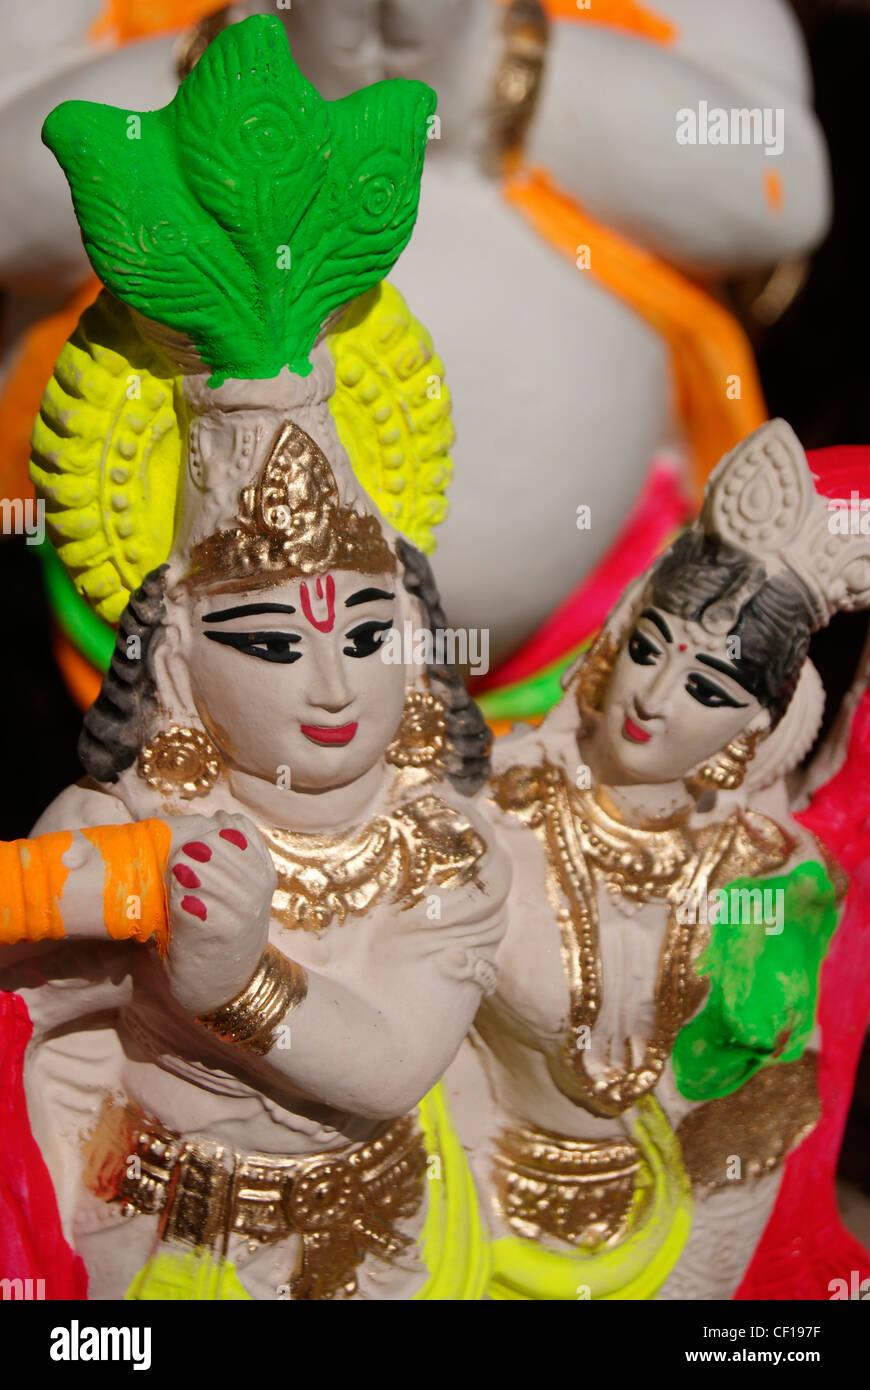 Rajasthan Handicraft effigy sculpture model of Lovely Krishna and Radha - Stock Image